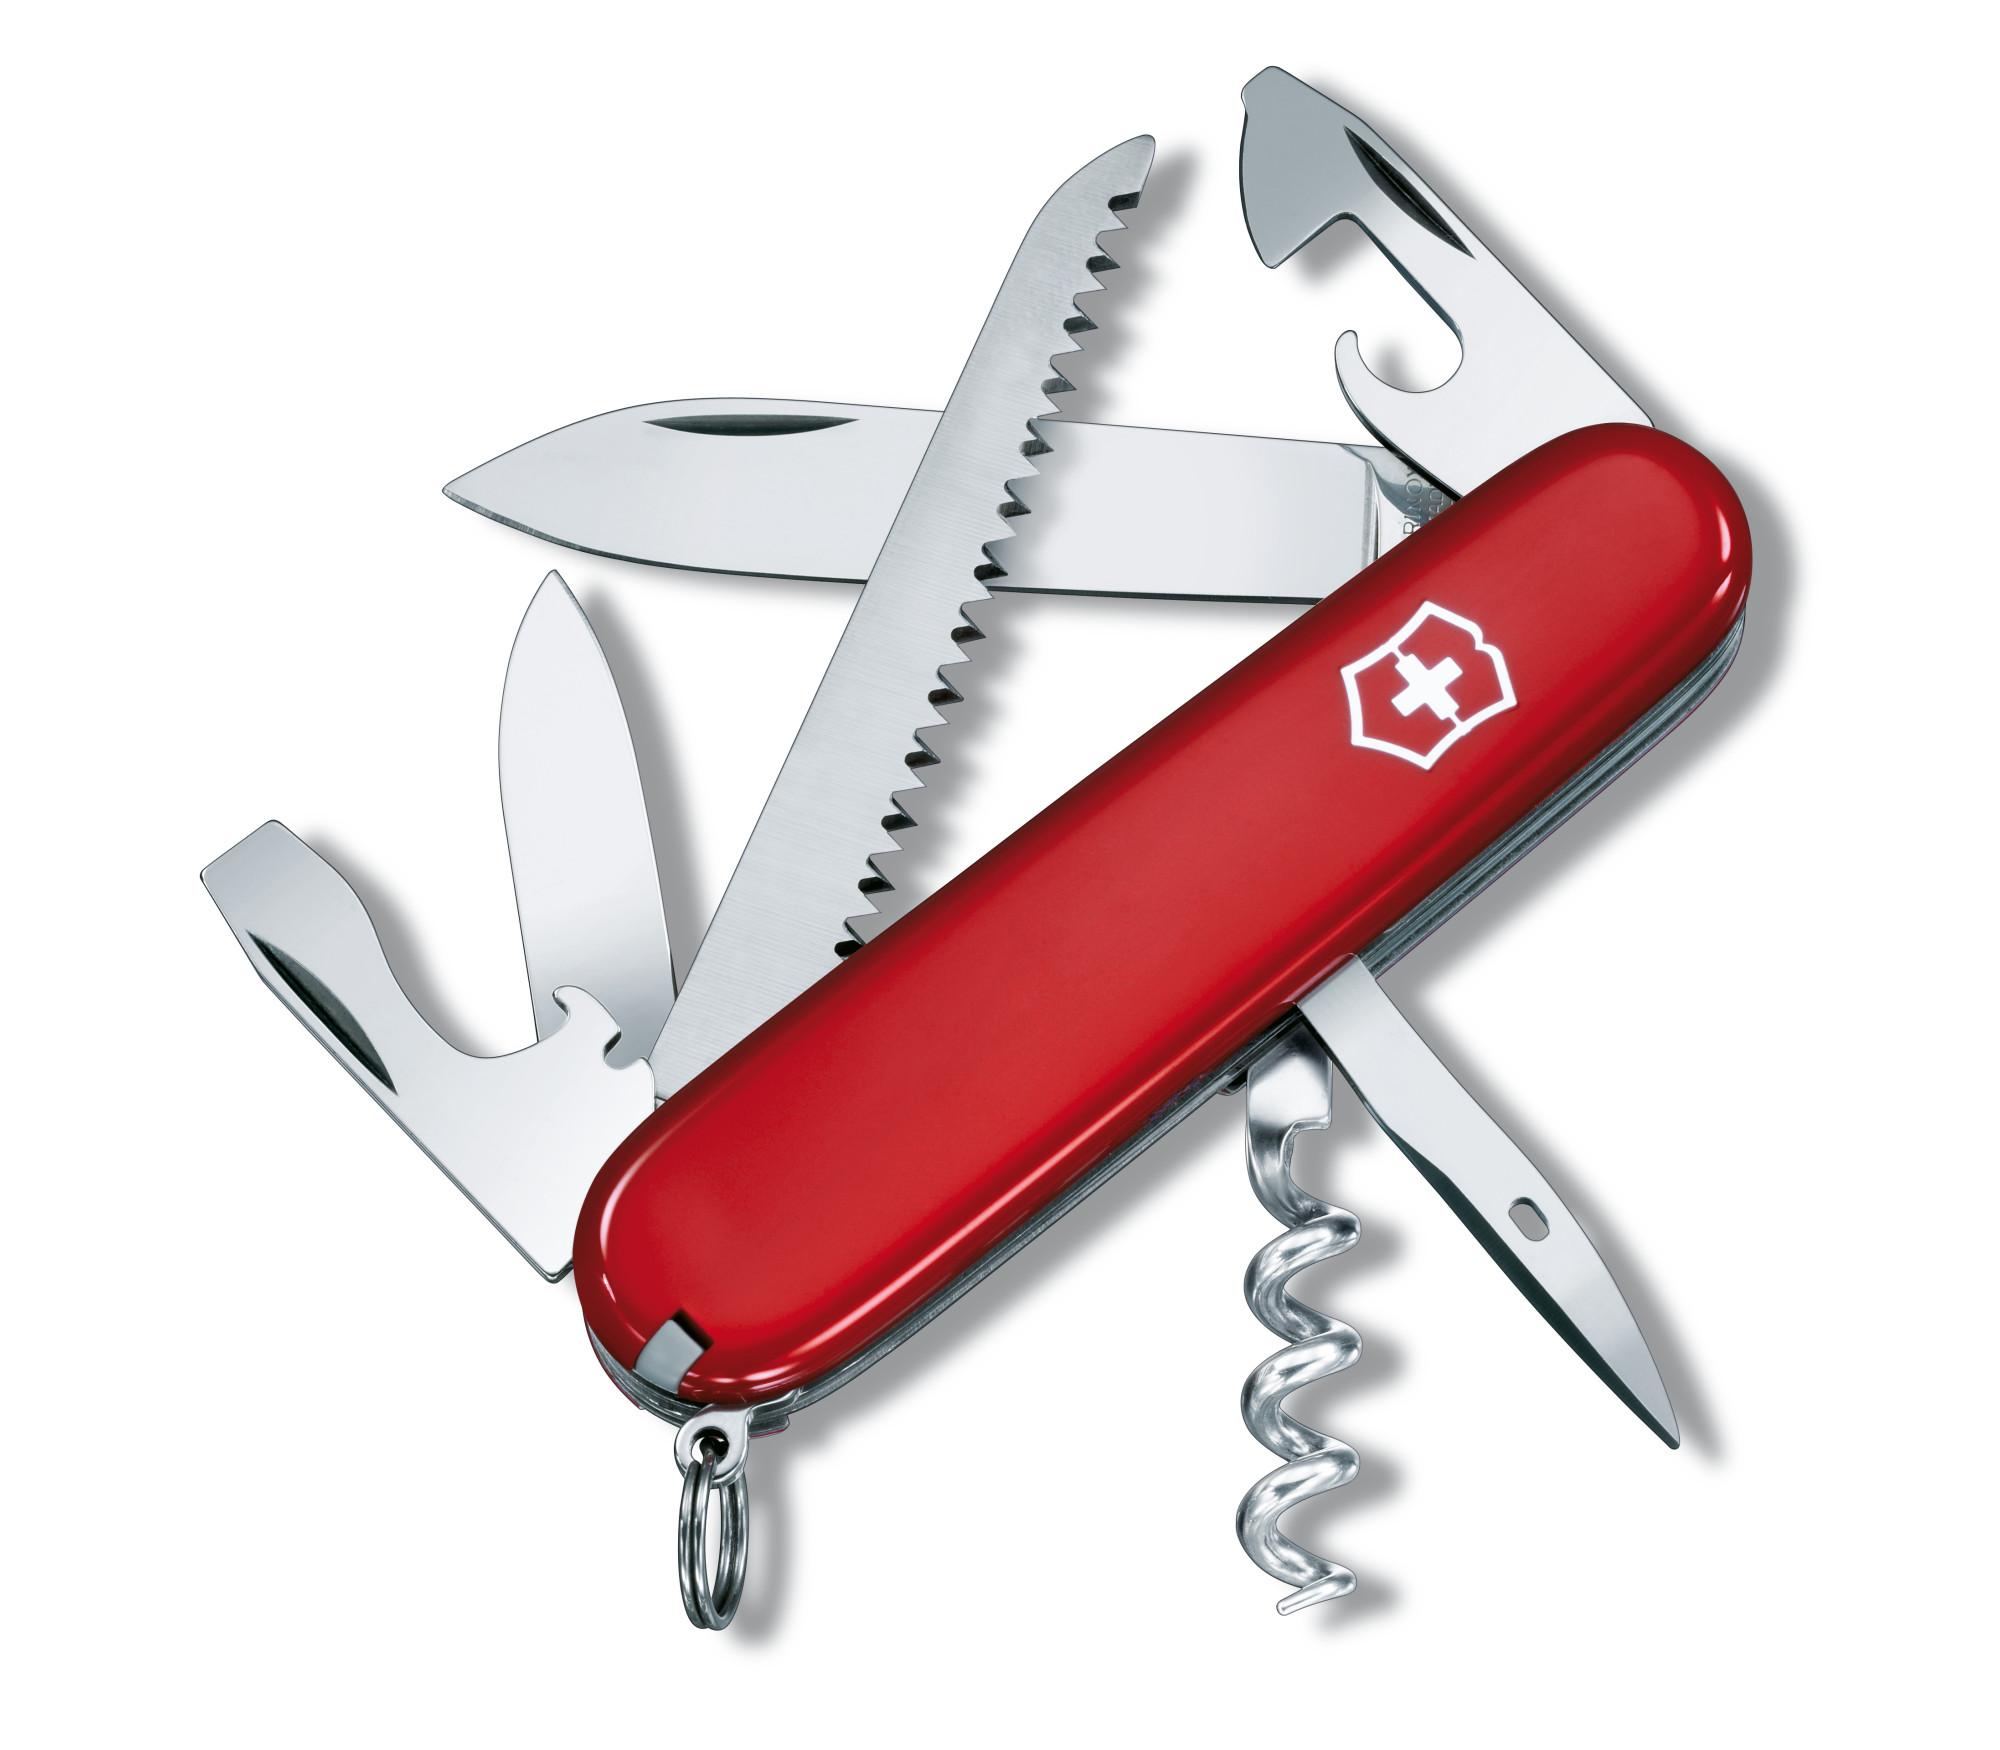 Victorinox Swiss Knife Camper Sku 1 3613 Zetos